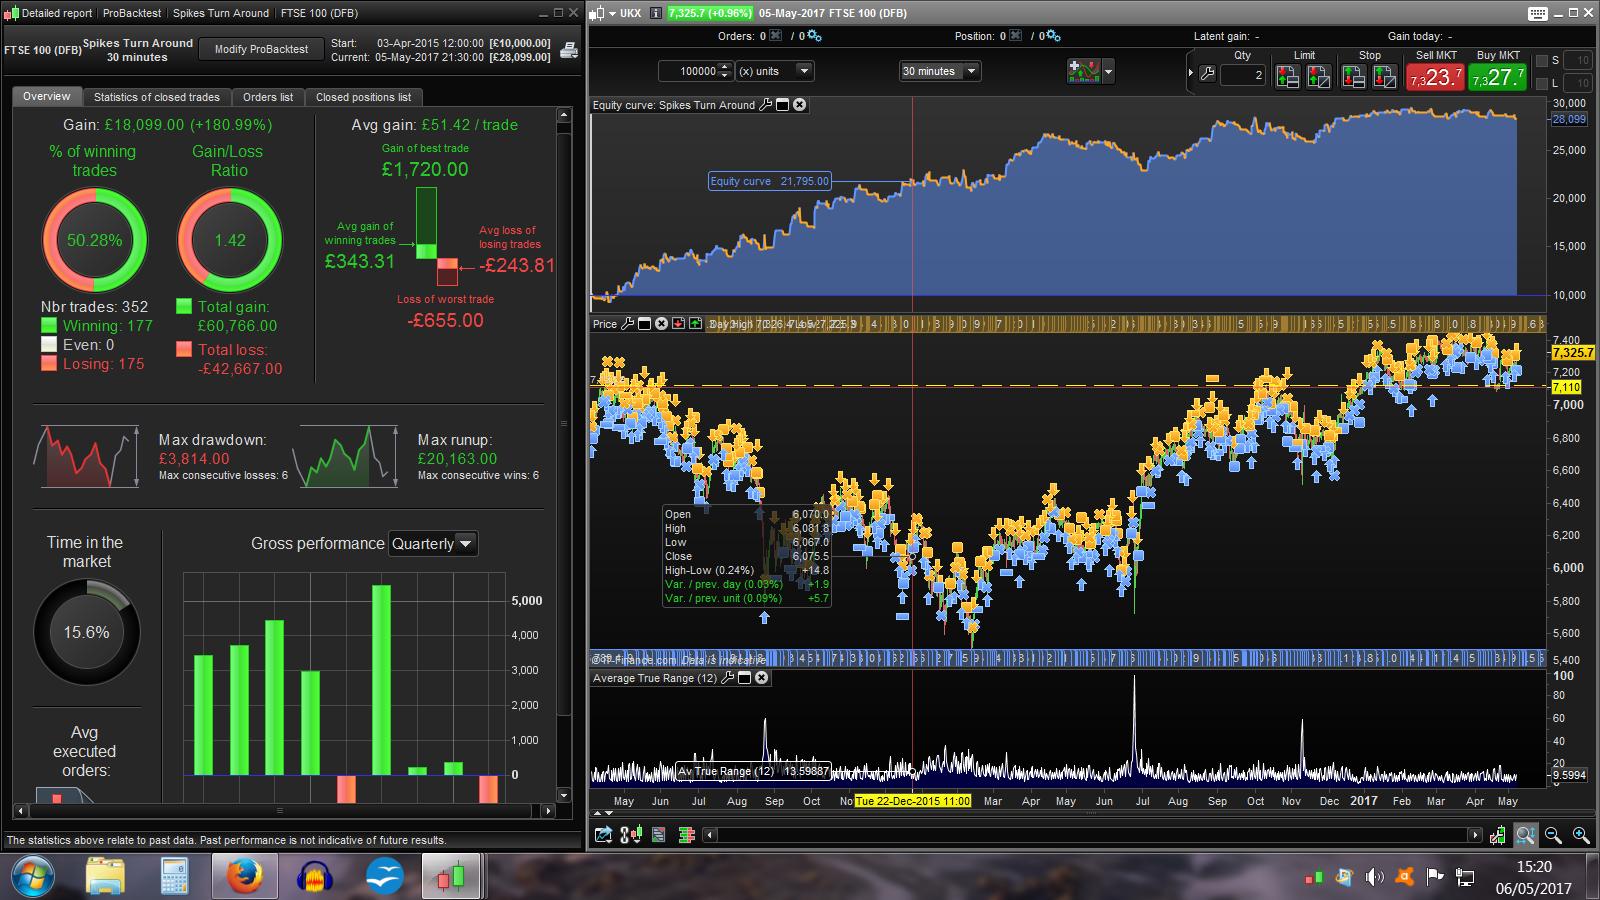 Popular intraday trading strategies